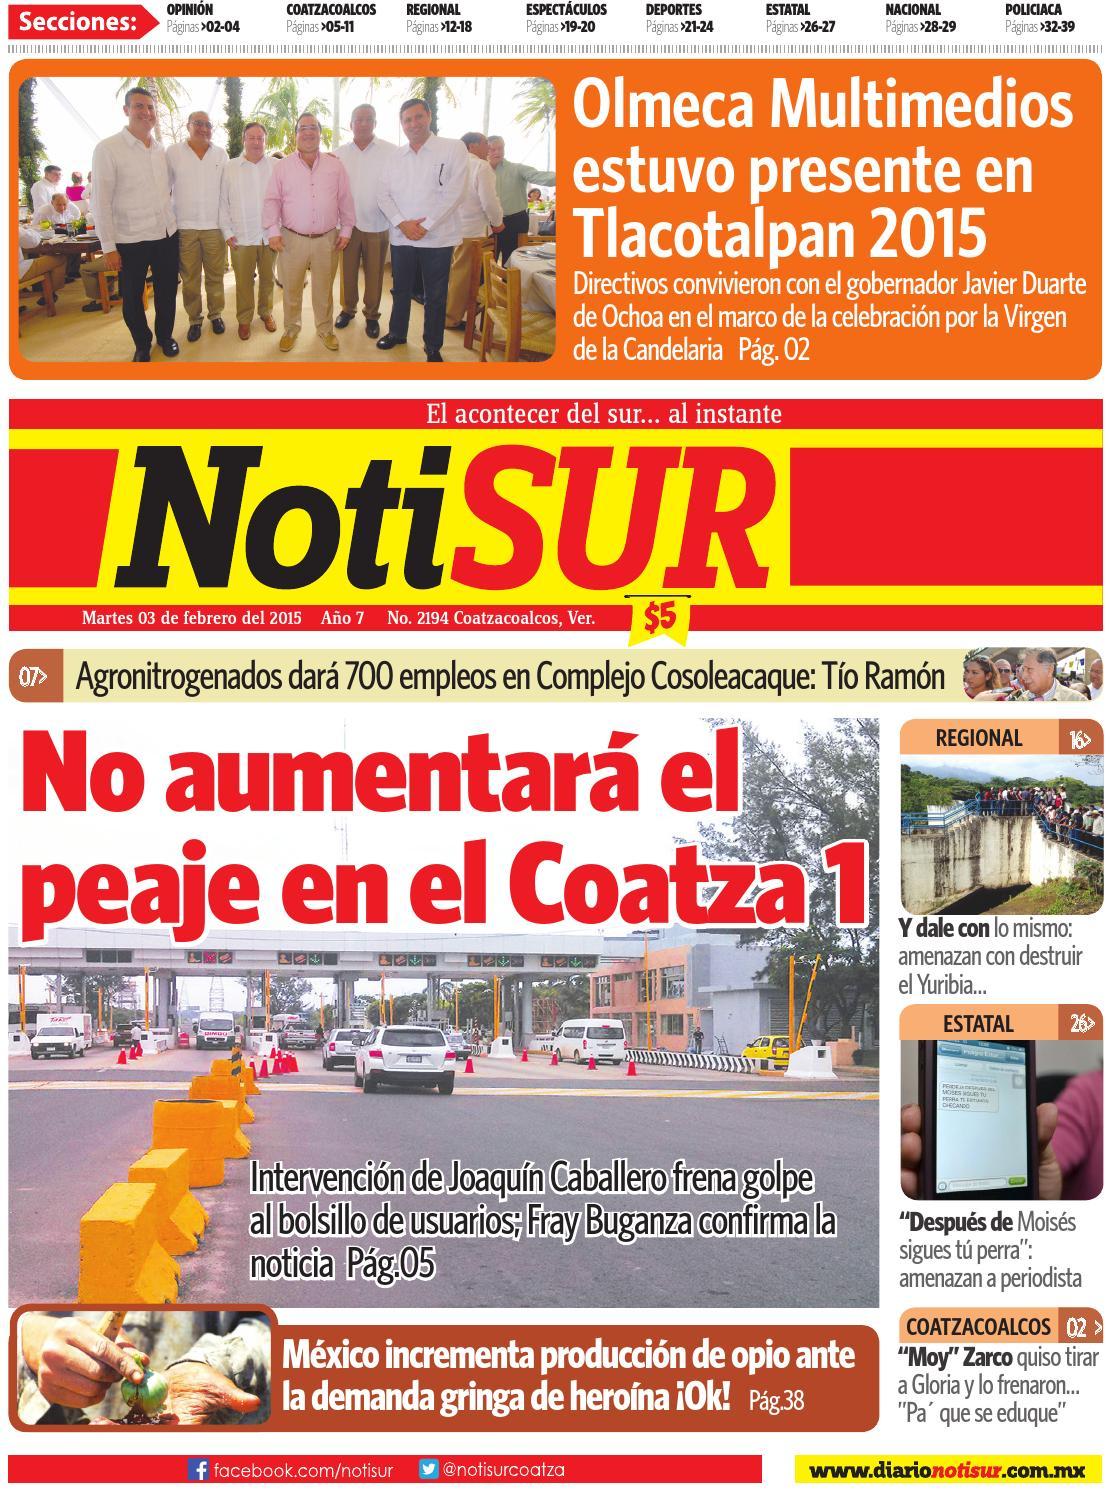 Notisur 03 De Febrero 2015 By Diario Notisur Coatzacoalcos 2015  # Muebles Buganza